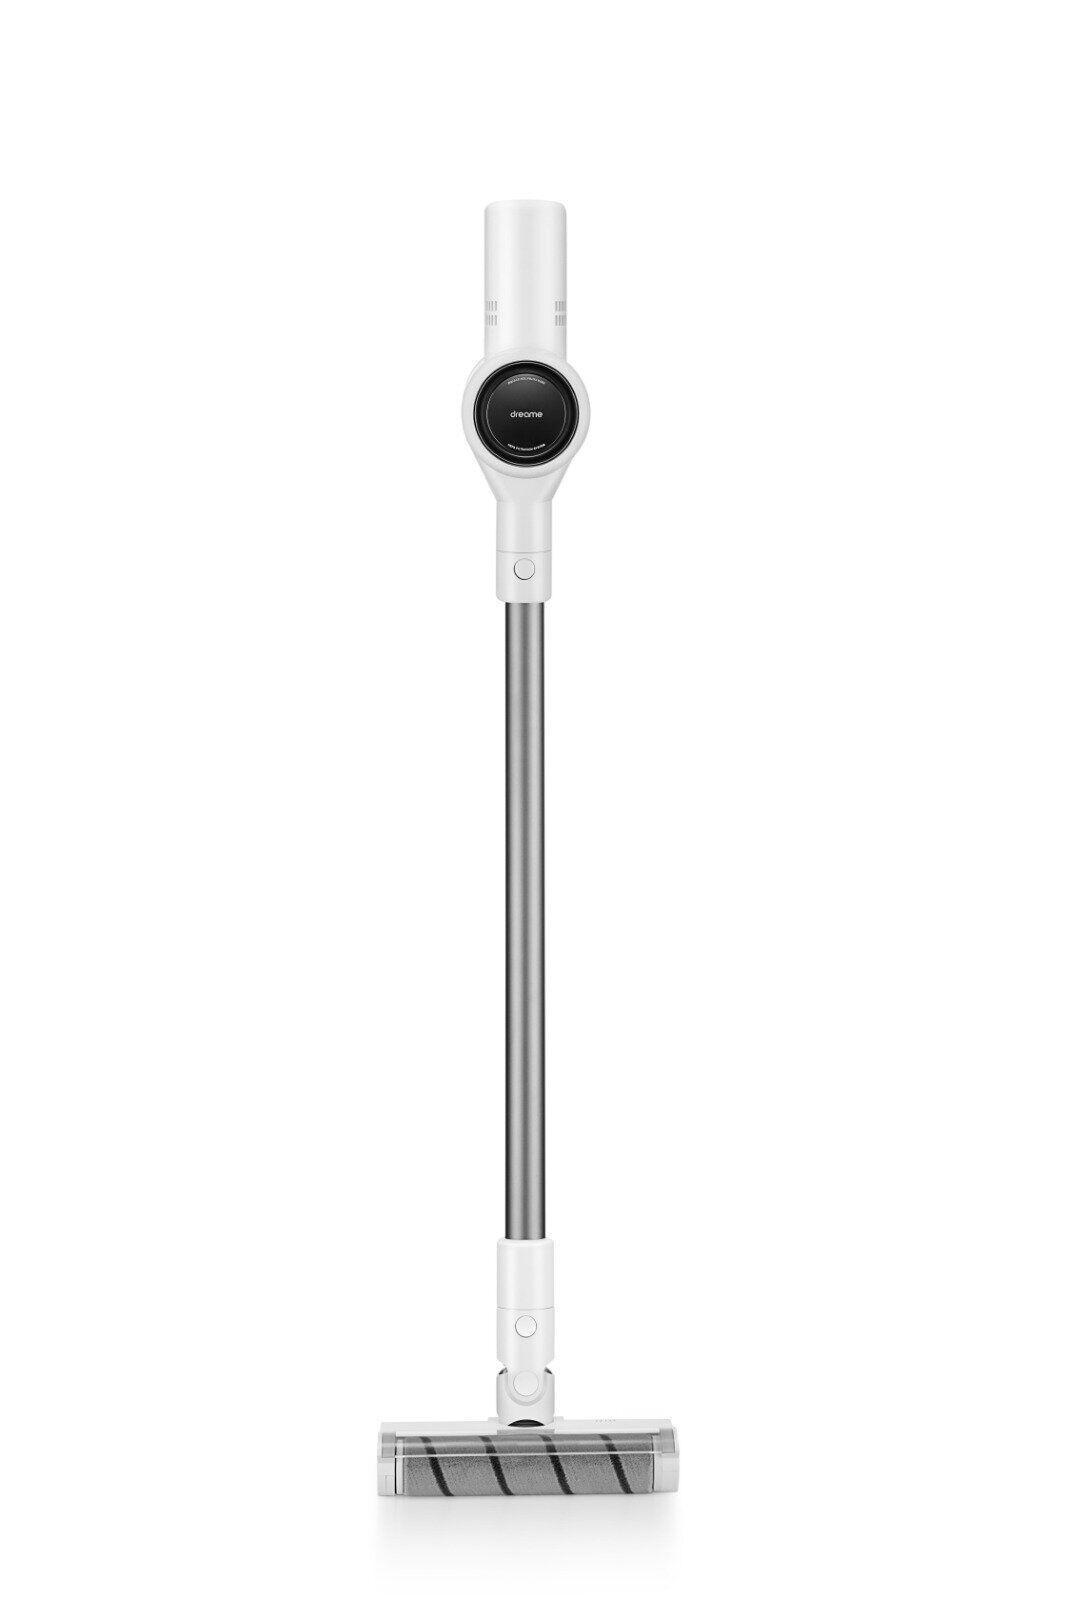 Вертикальные пылесосы Пылесос Xiaomi Dreame Boreas V10 EU (White) Global Version 315b86f0ea87bc306eb7d55a92bf8066.jpg